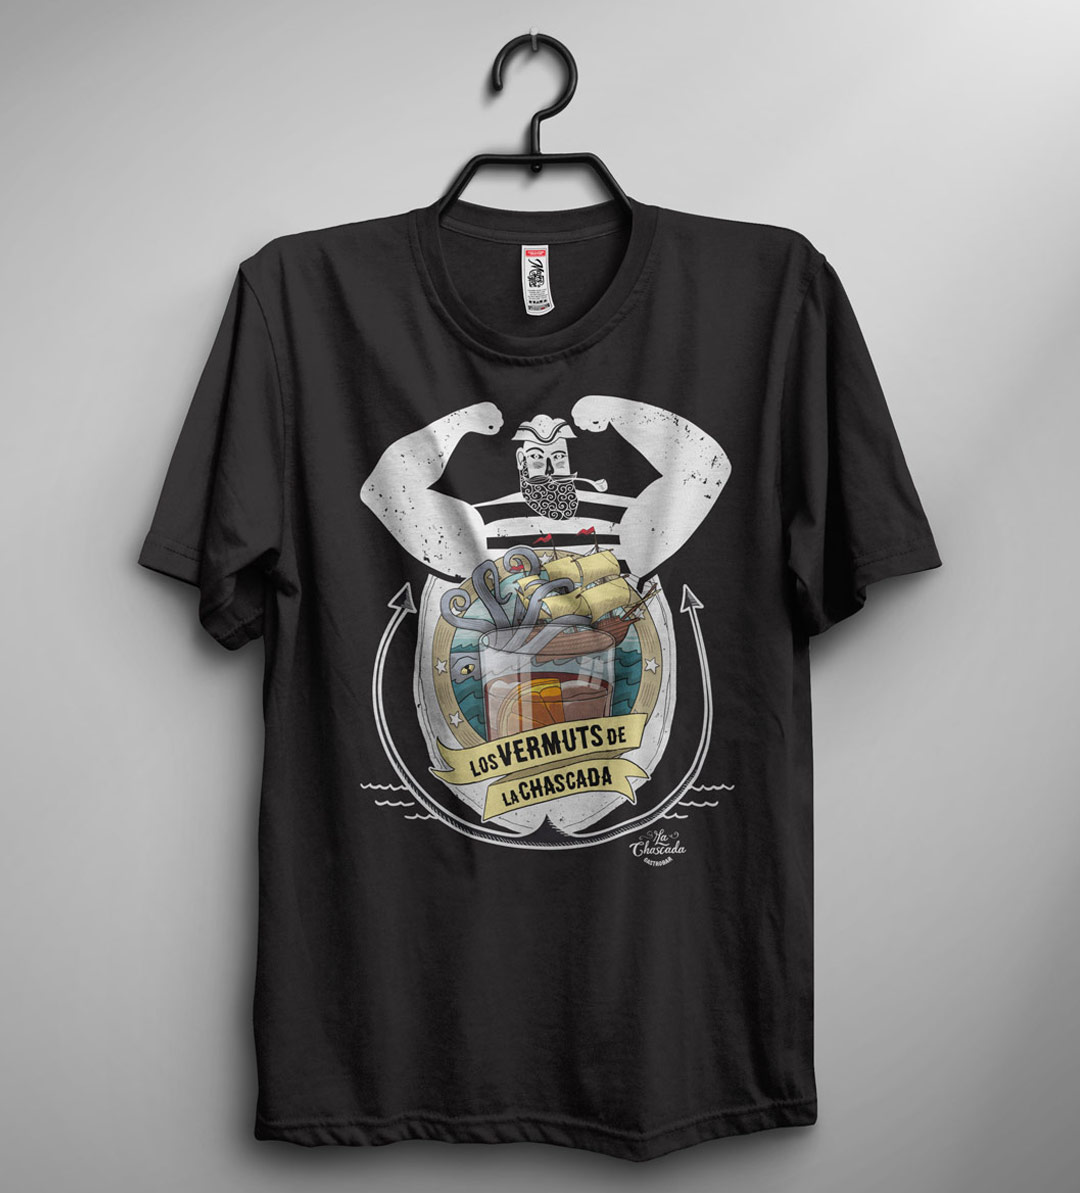 imagen corporativa camiseta negra chascada gastrobar